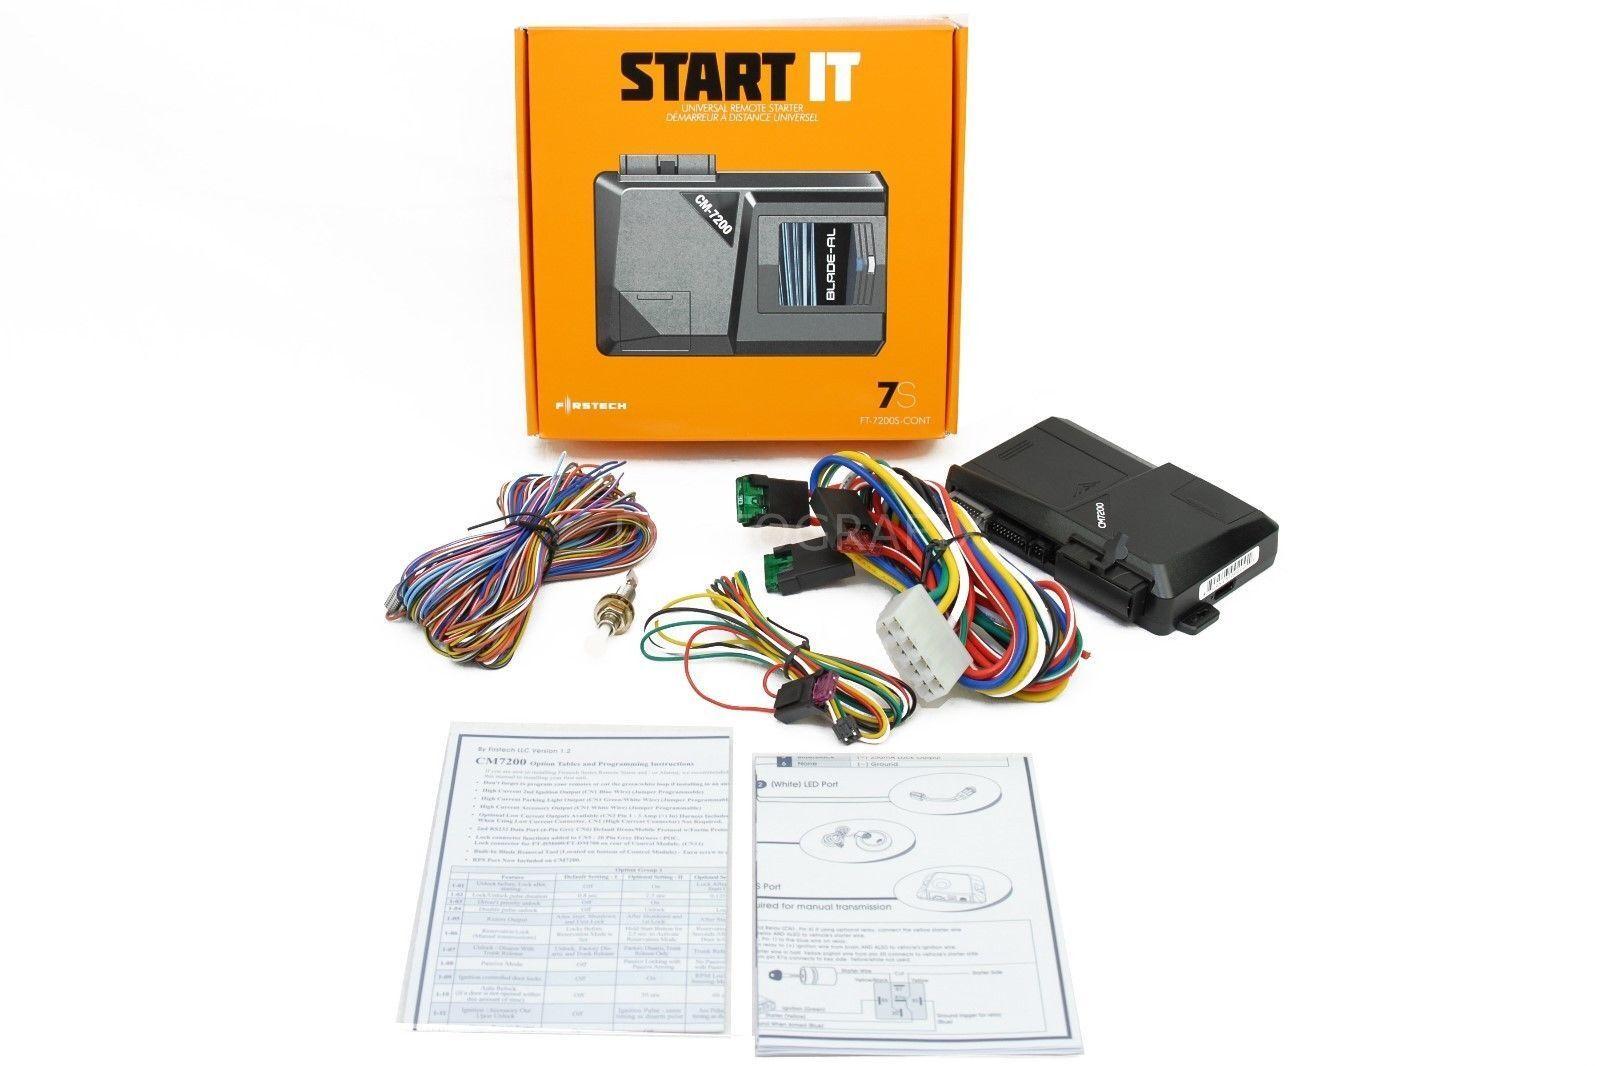 Compustar Ft7200ascont Universal Remote Start Keyless Entry Security 2012 Dodge Ram Starter Stock Photo